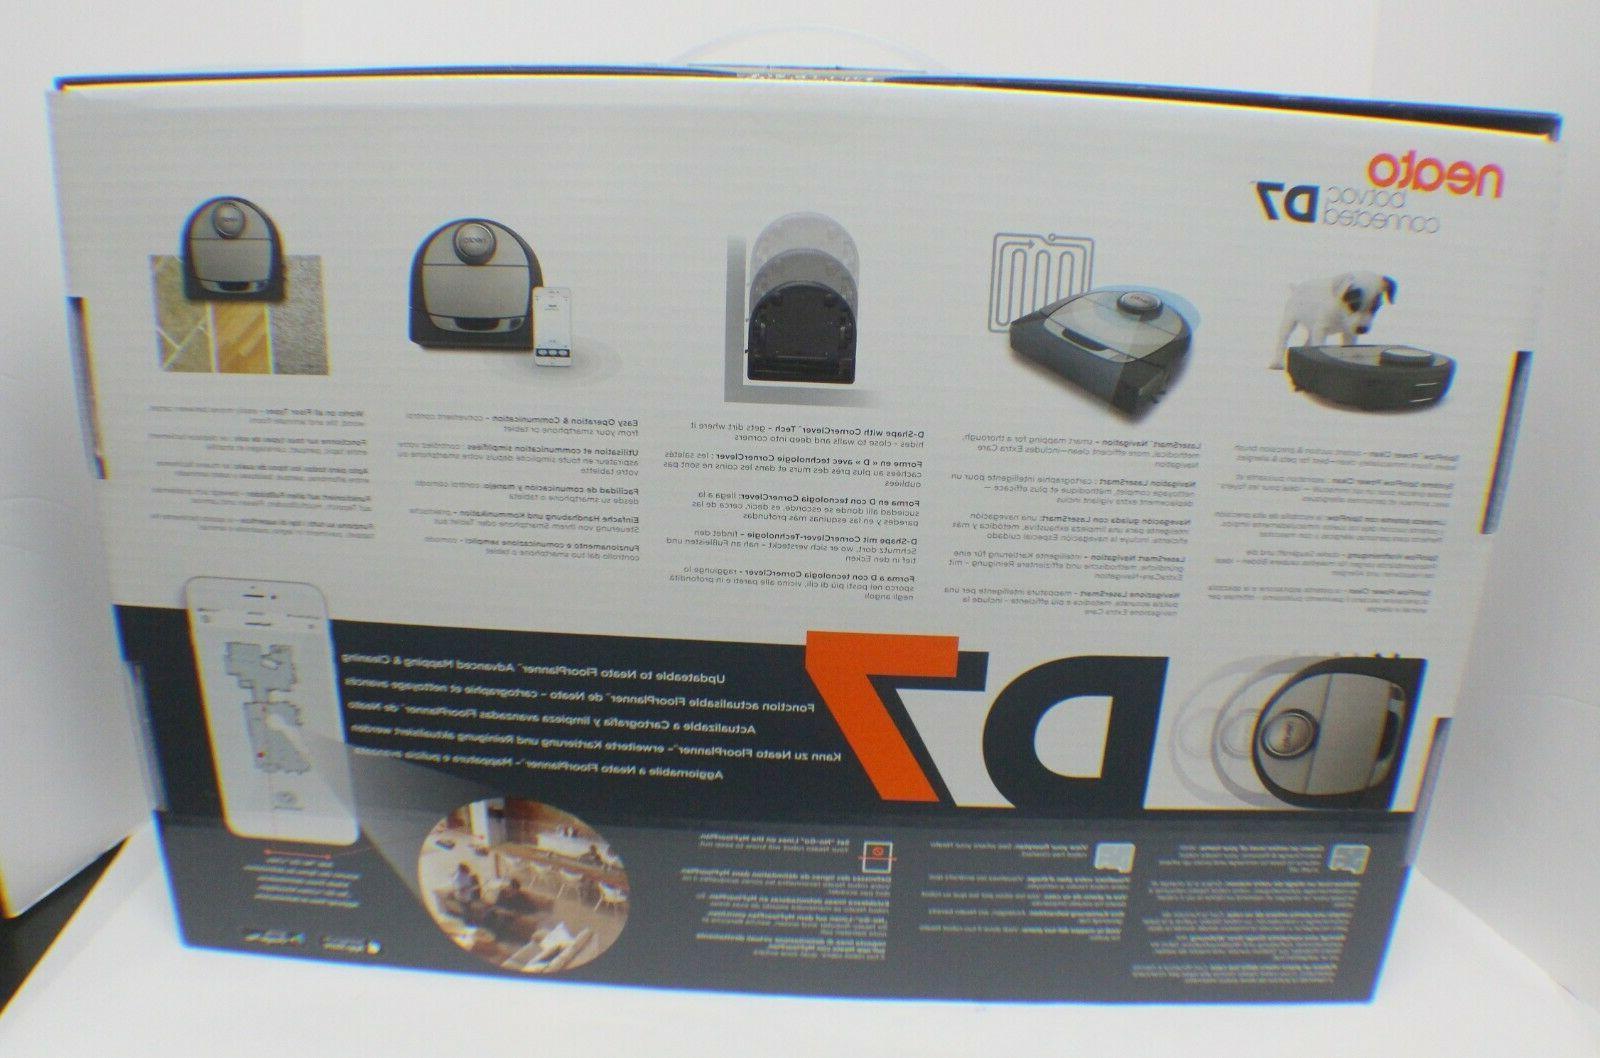 Neato D7 Grey Robotic Vacuum Cleaner - NEW